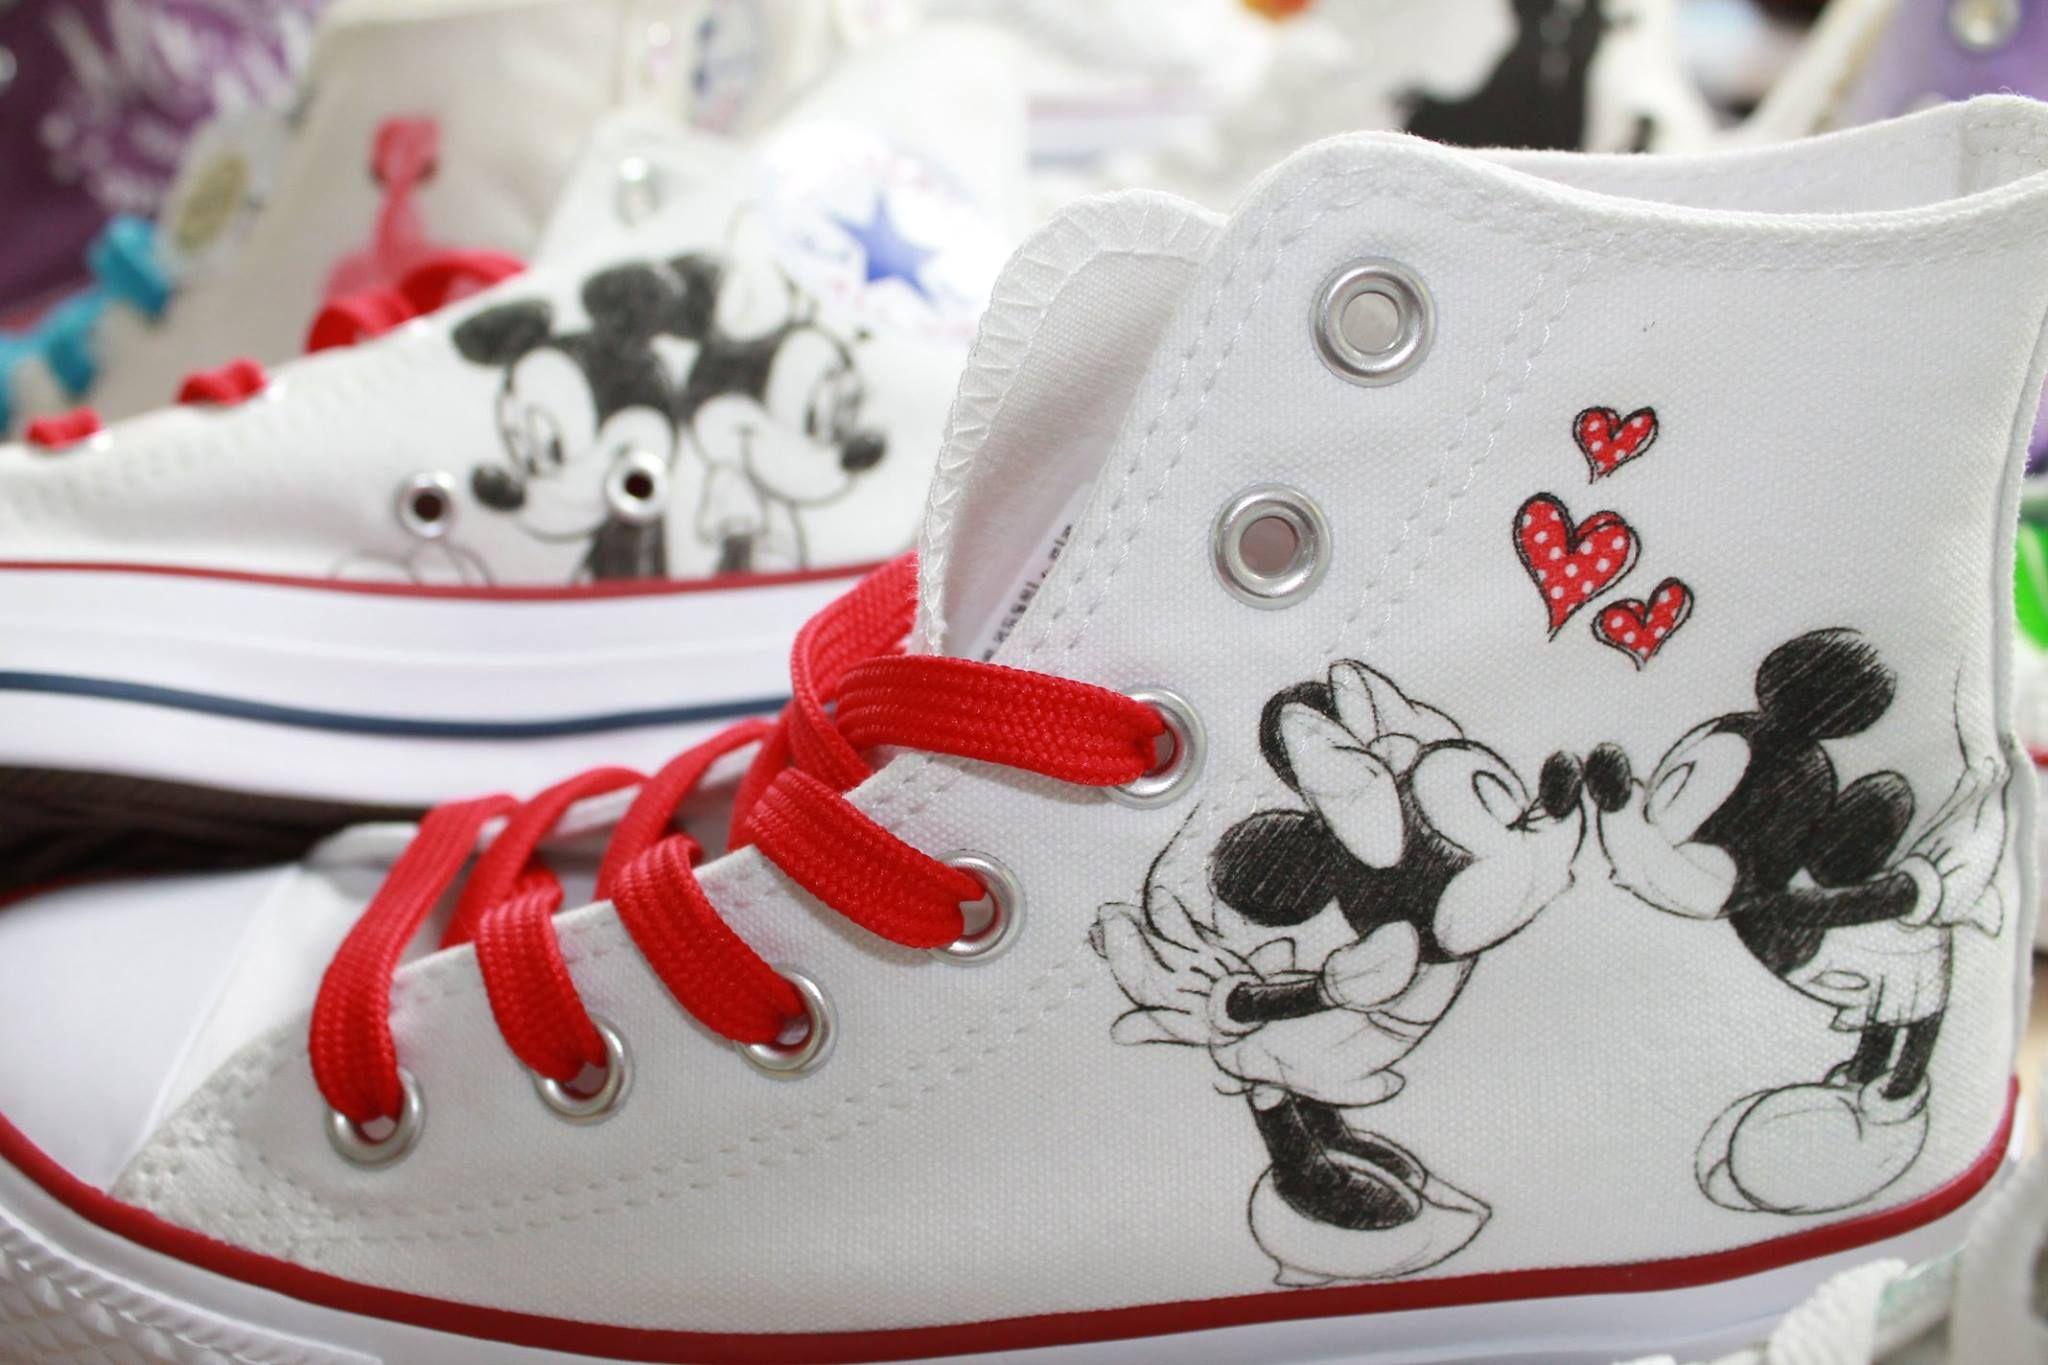 Customized Chucks by notlikeyou :) #disney #mickeymouse